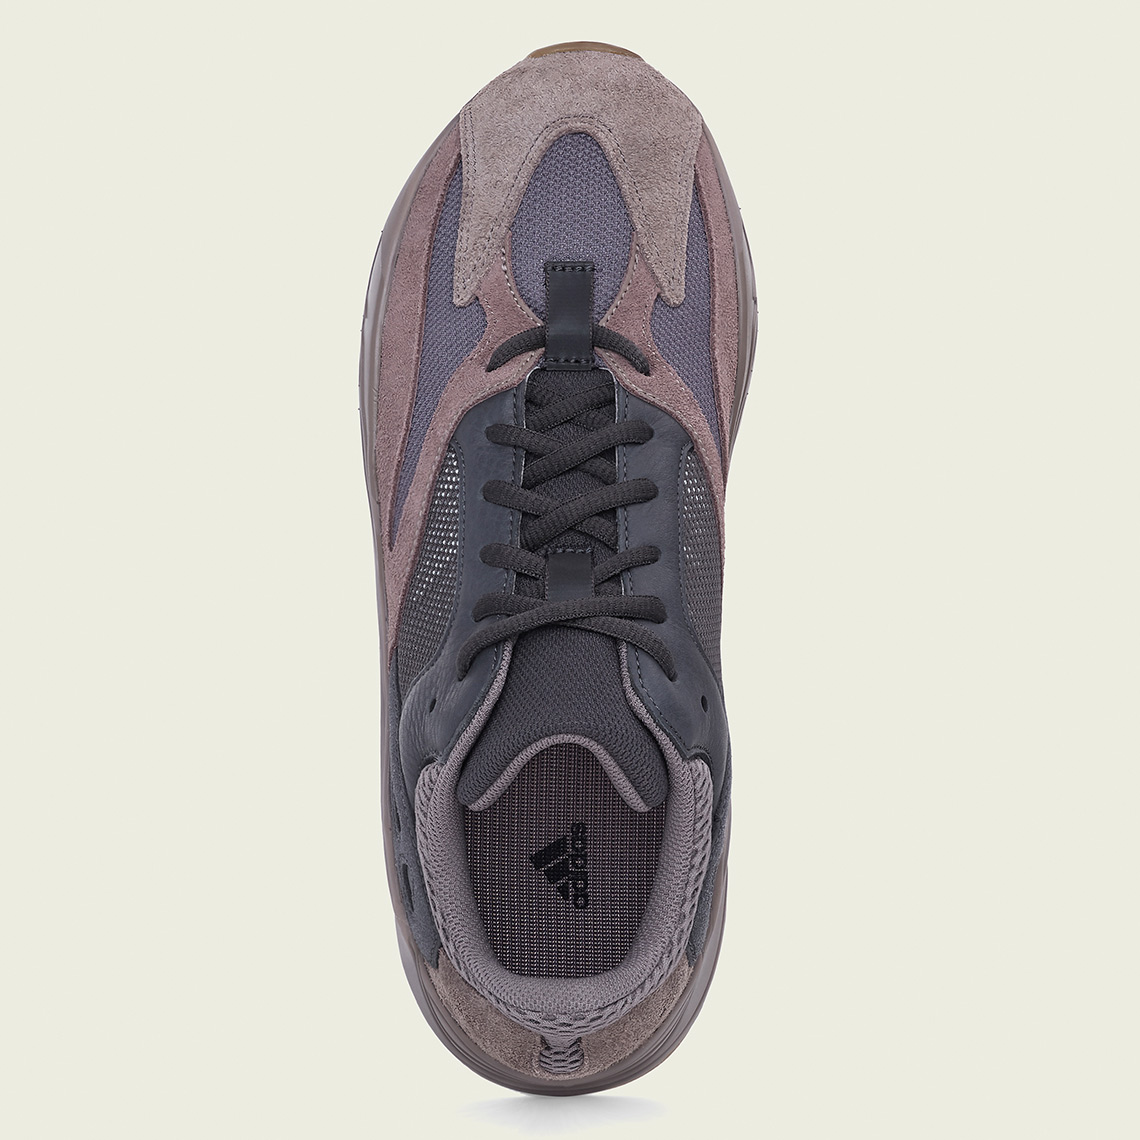 3400031c0414c adidas Yeezy Boost 700 Mauve Online Raffles + Store List ...